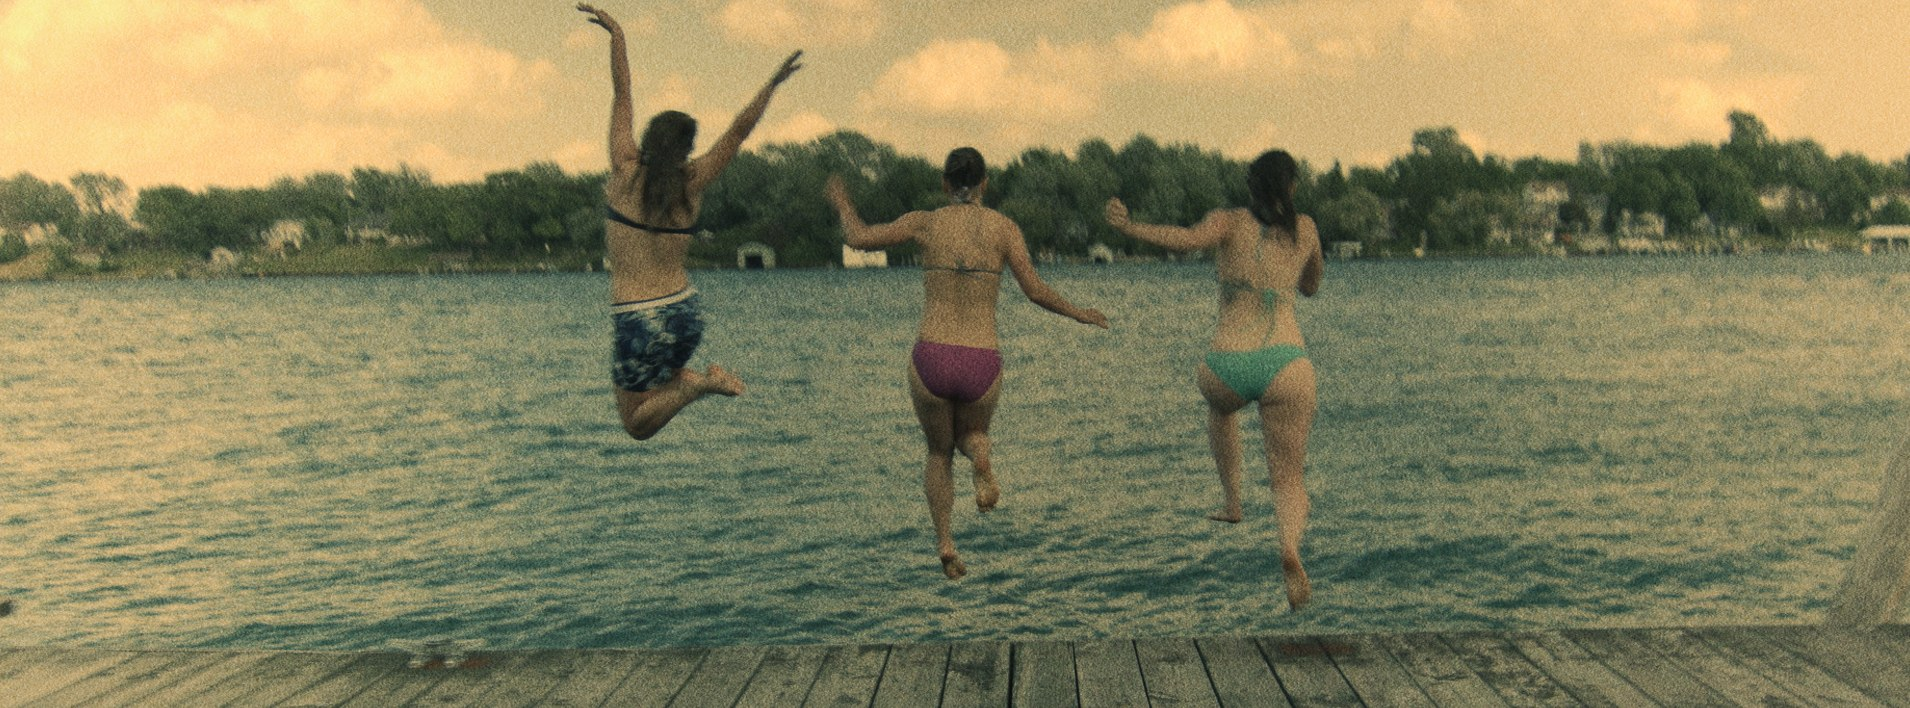 girls_jumping.jpg